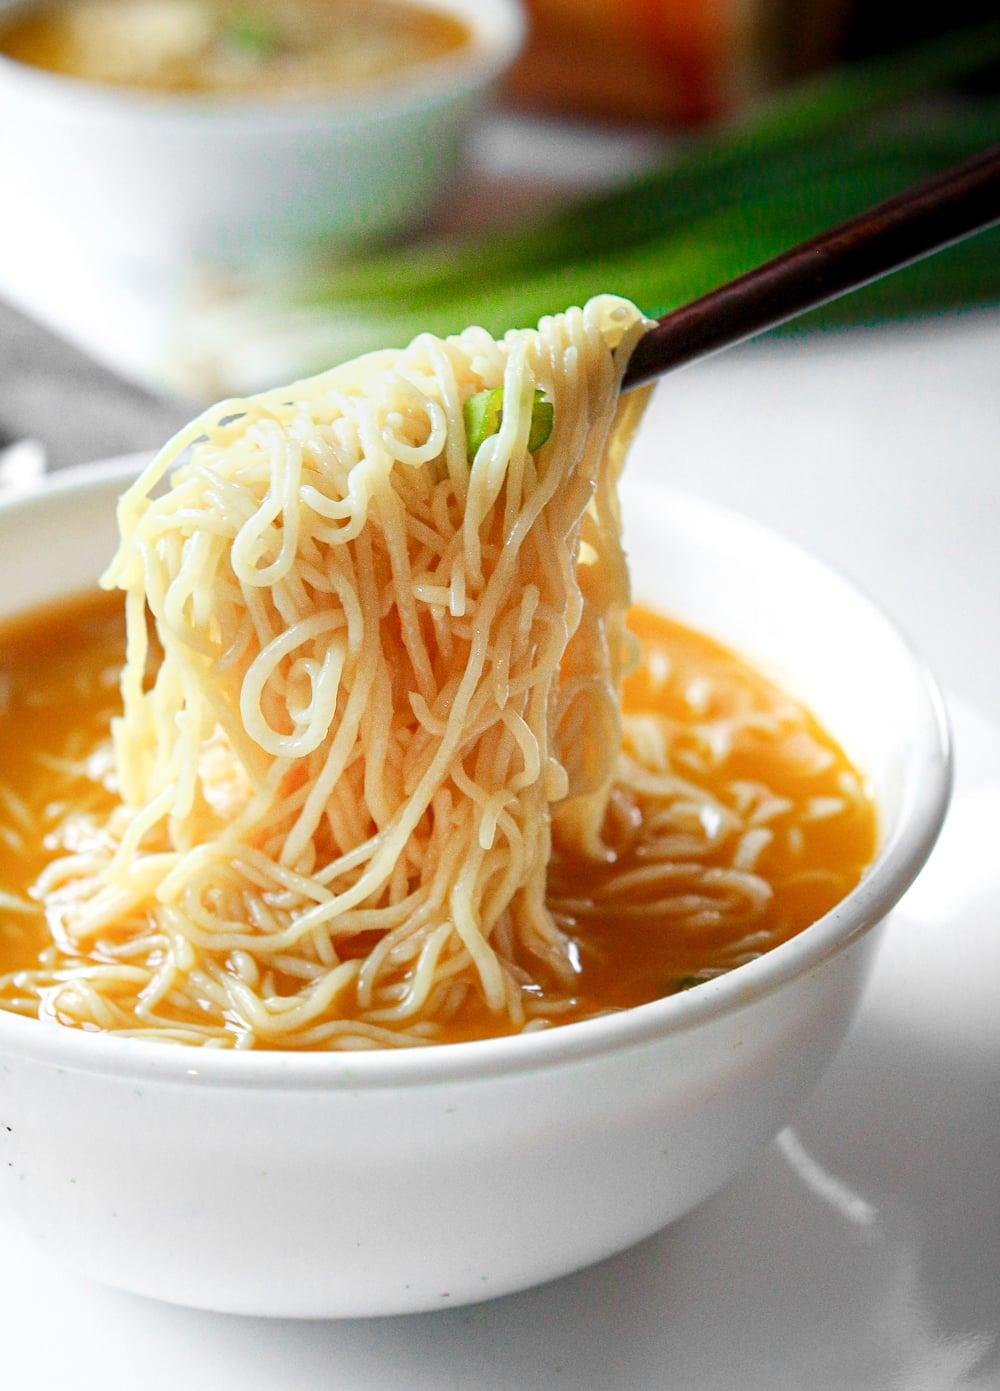 Chopsticks holding noodles above soup.